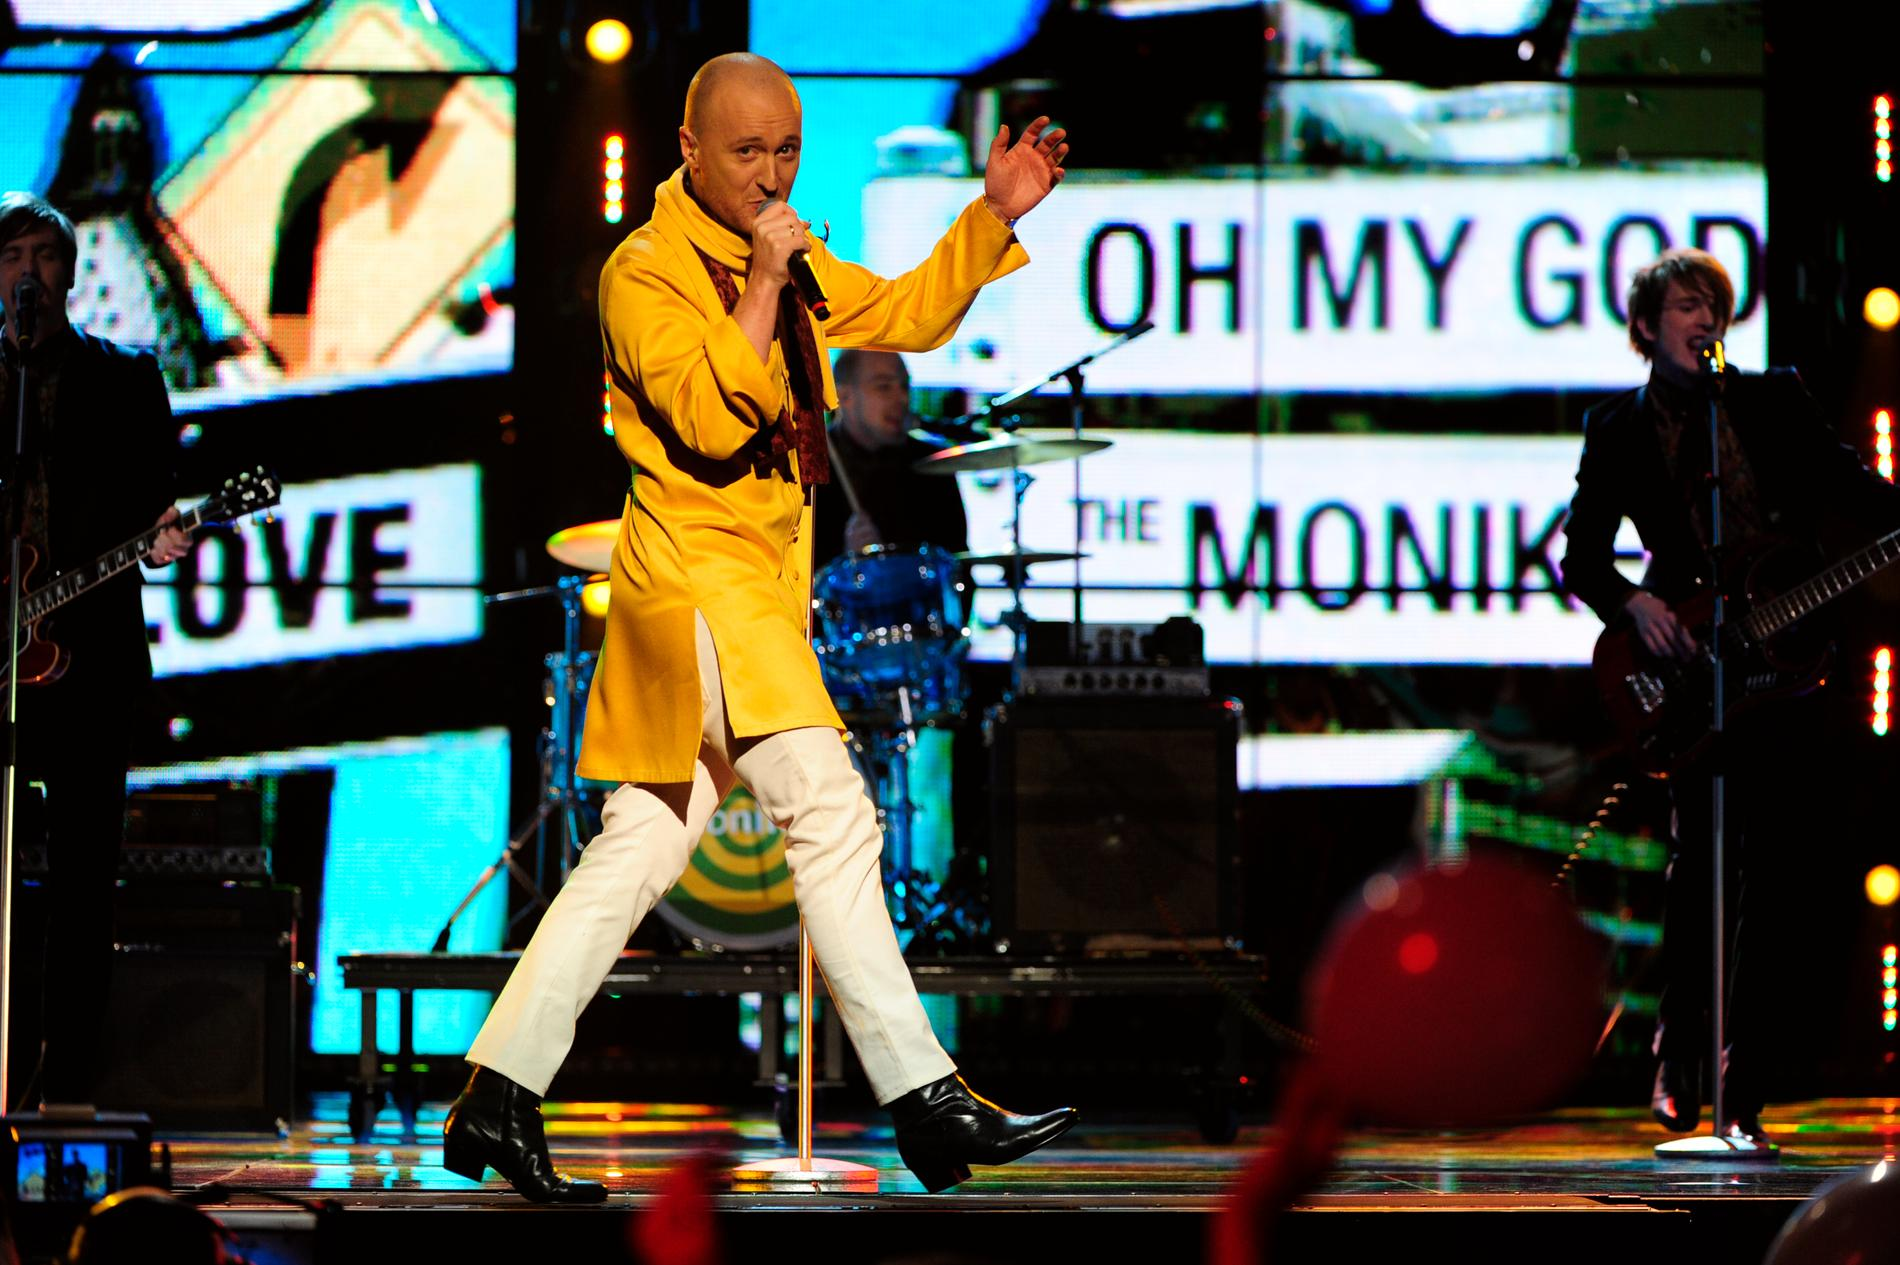 "Daniel ""The Moniker"" Karlsson gjorde succé med ""Oh my god!"" i Mello 2011."